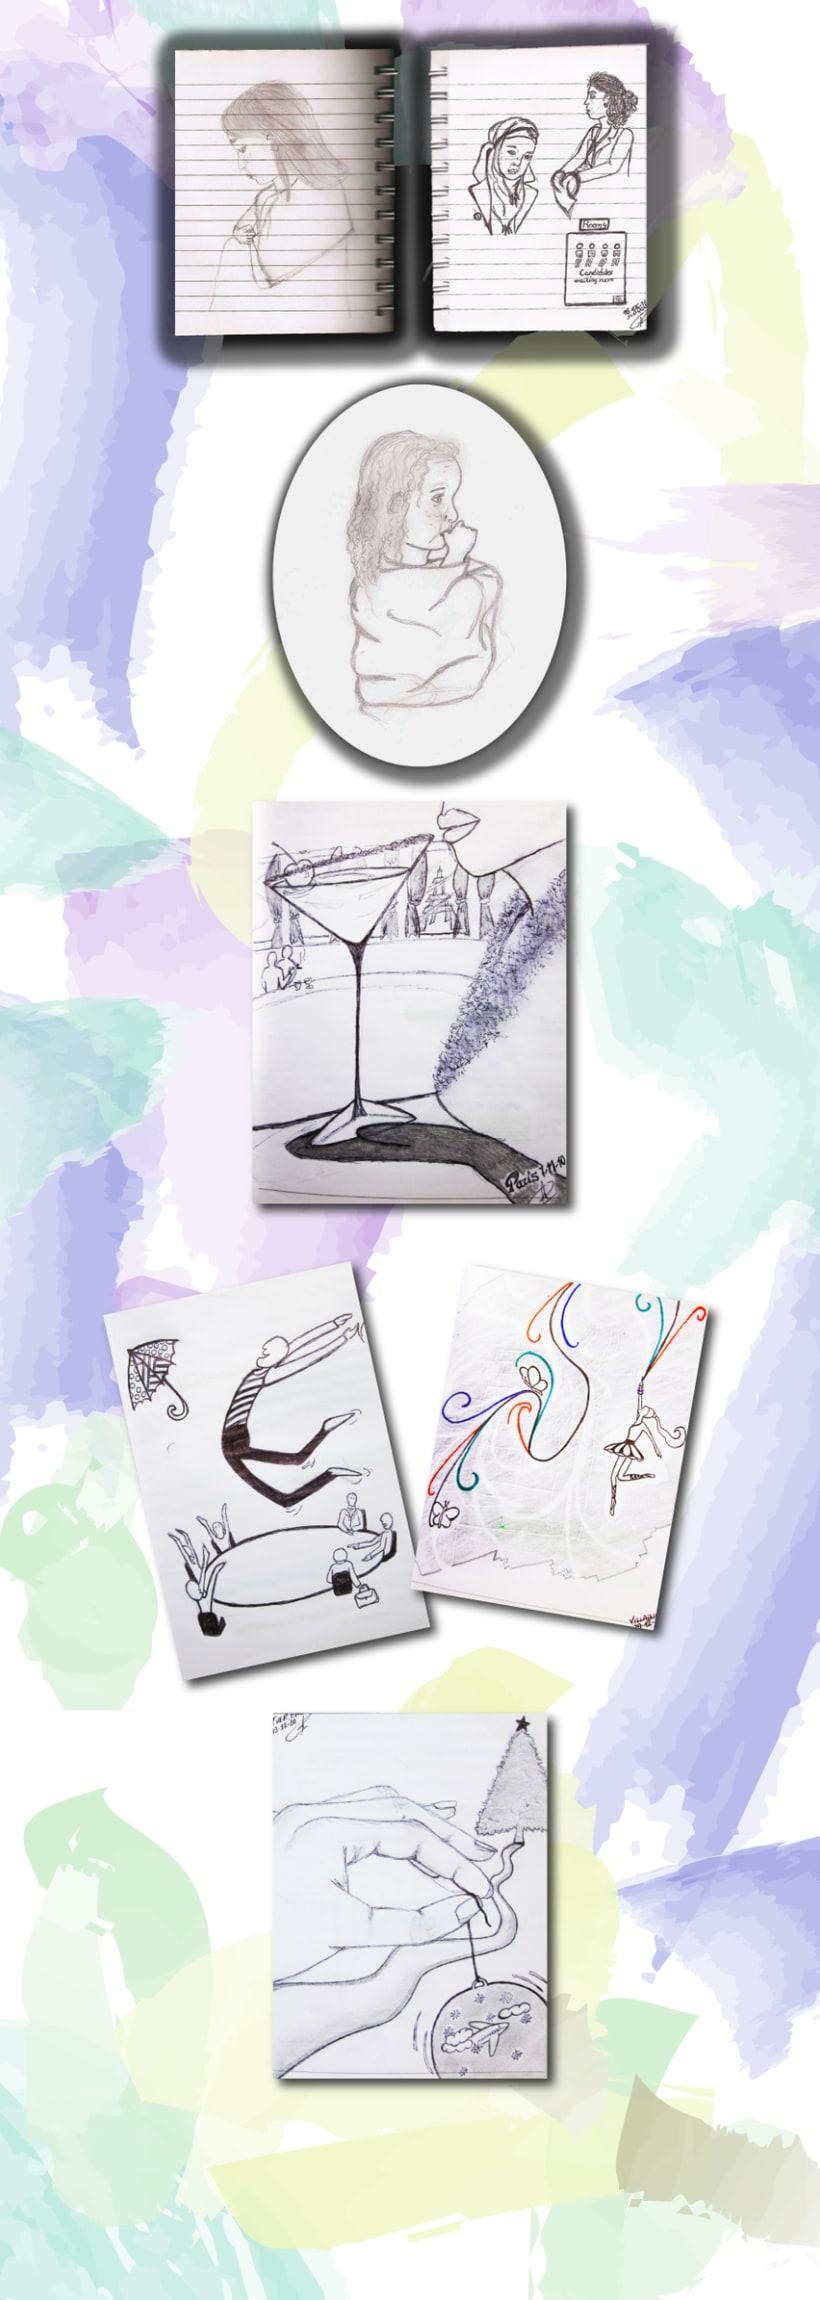 Sketches / Bocetos 2